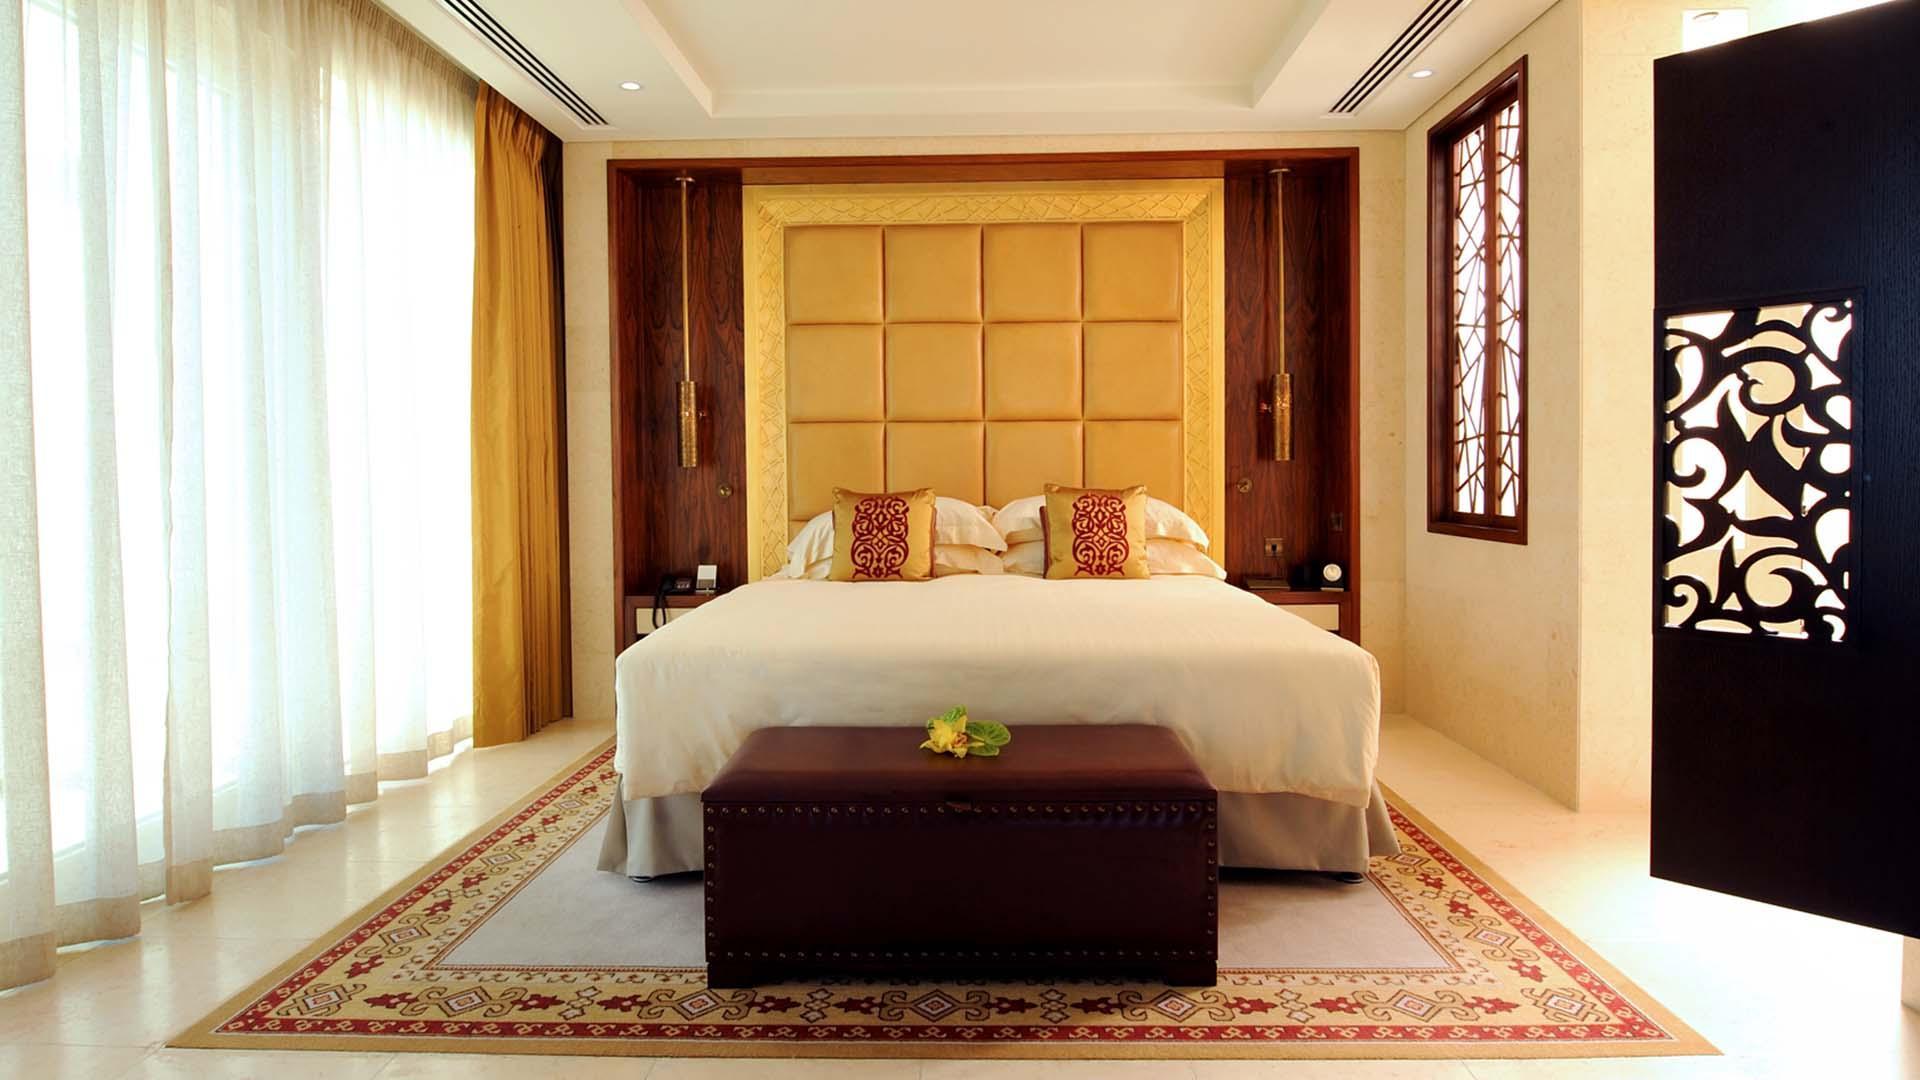 Landmark Suite image 1 at Raffles Dubai by null, Dubai, United Arab Emirates